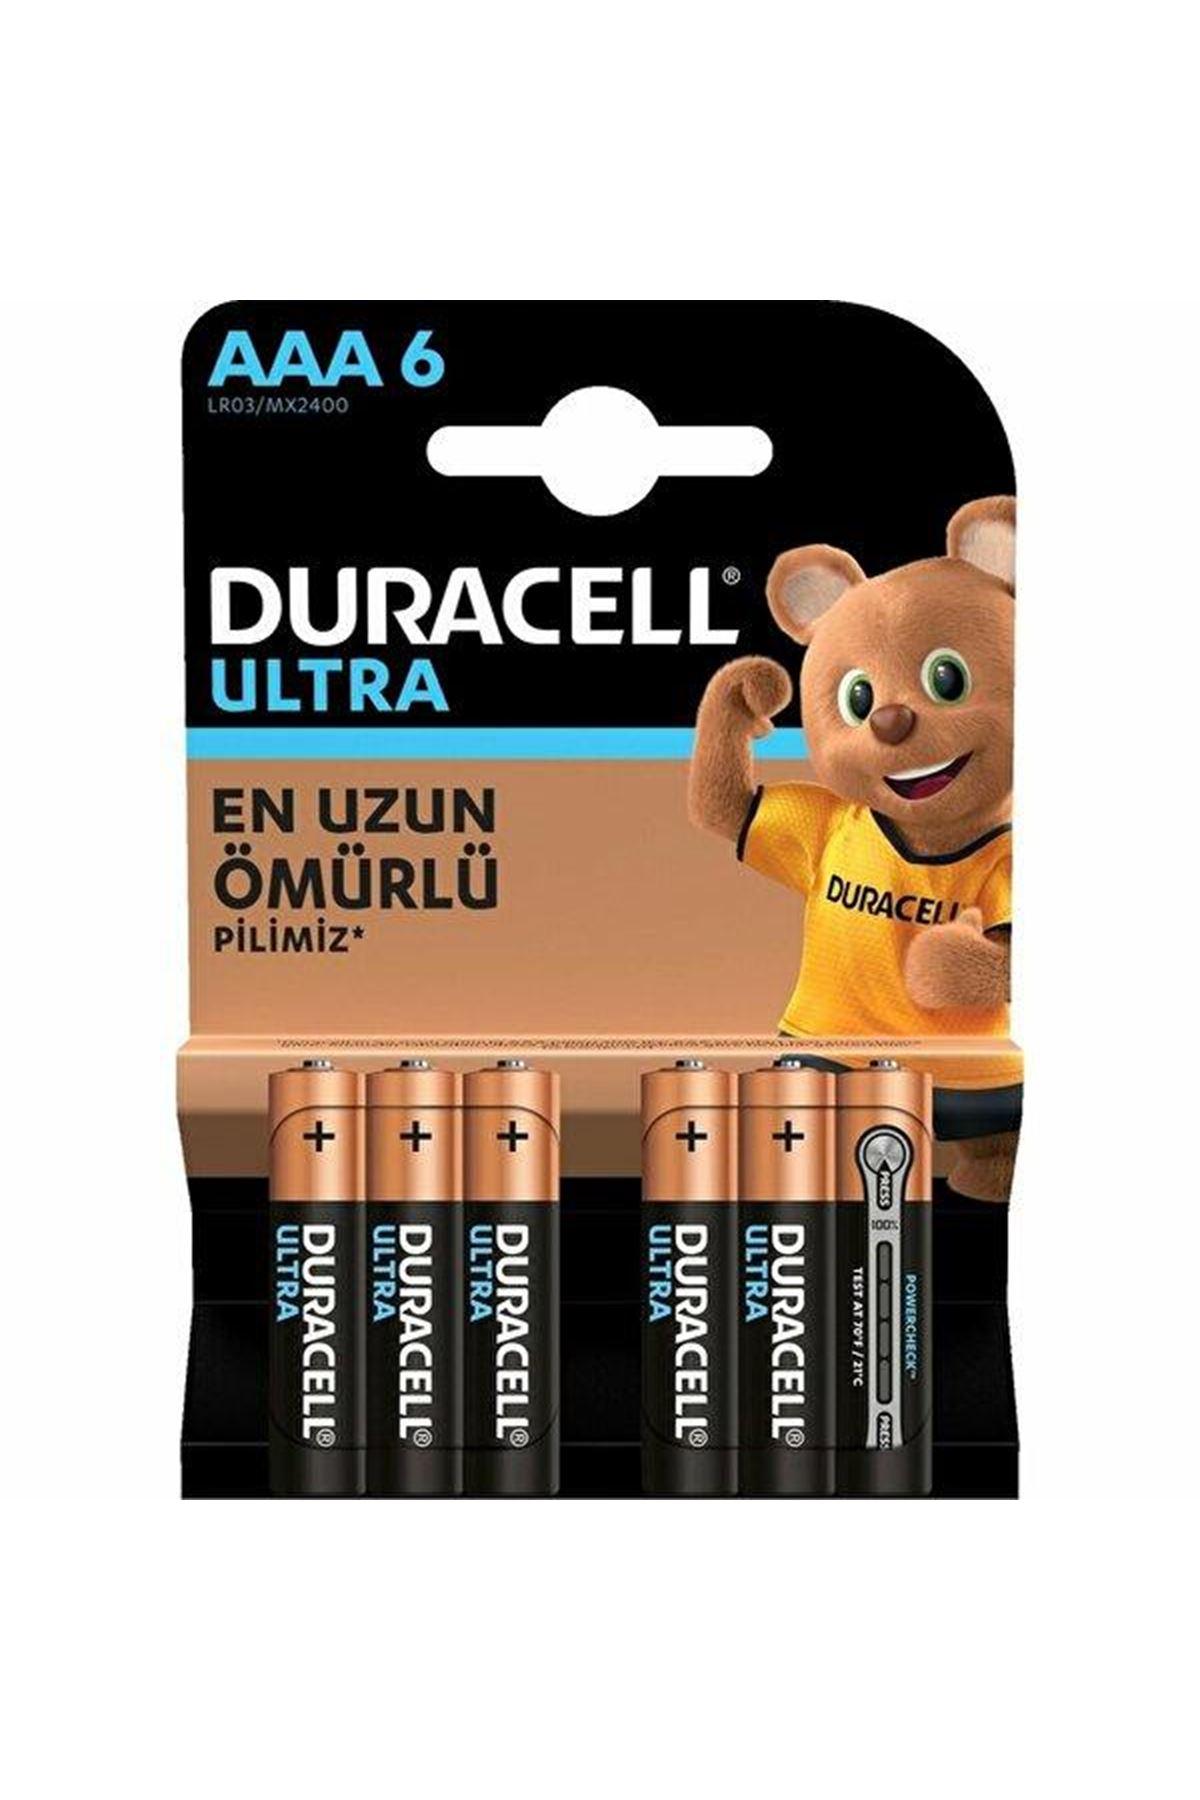 Duracell Ultra İnce Kalem Pil 6LI AAA